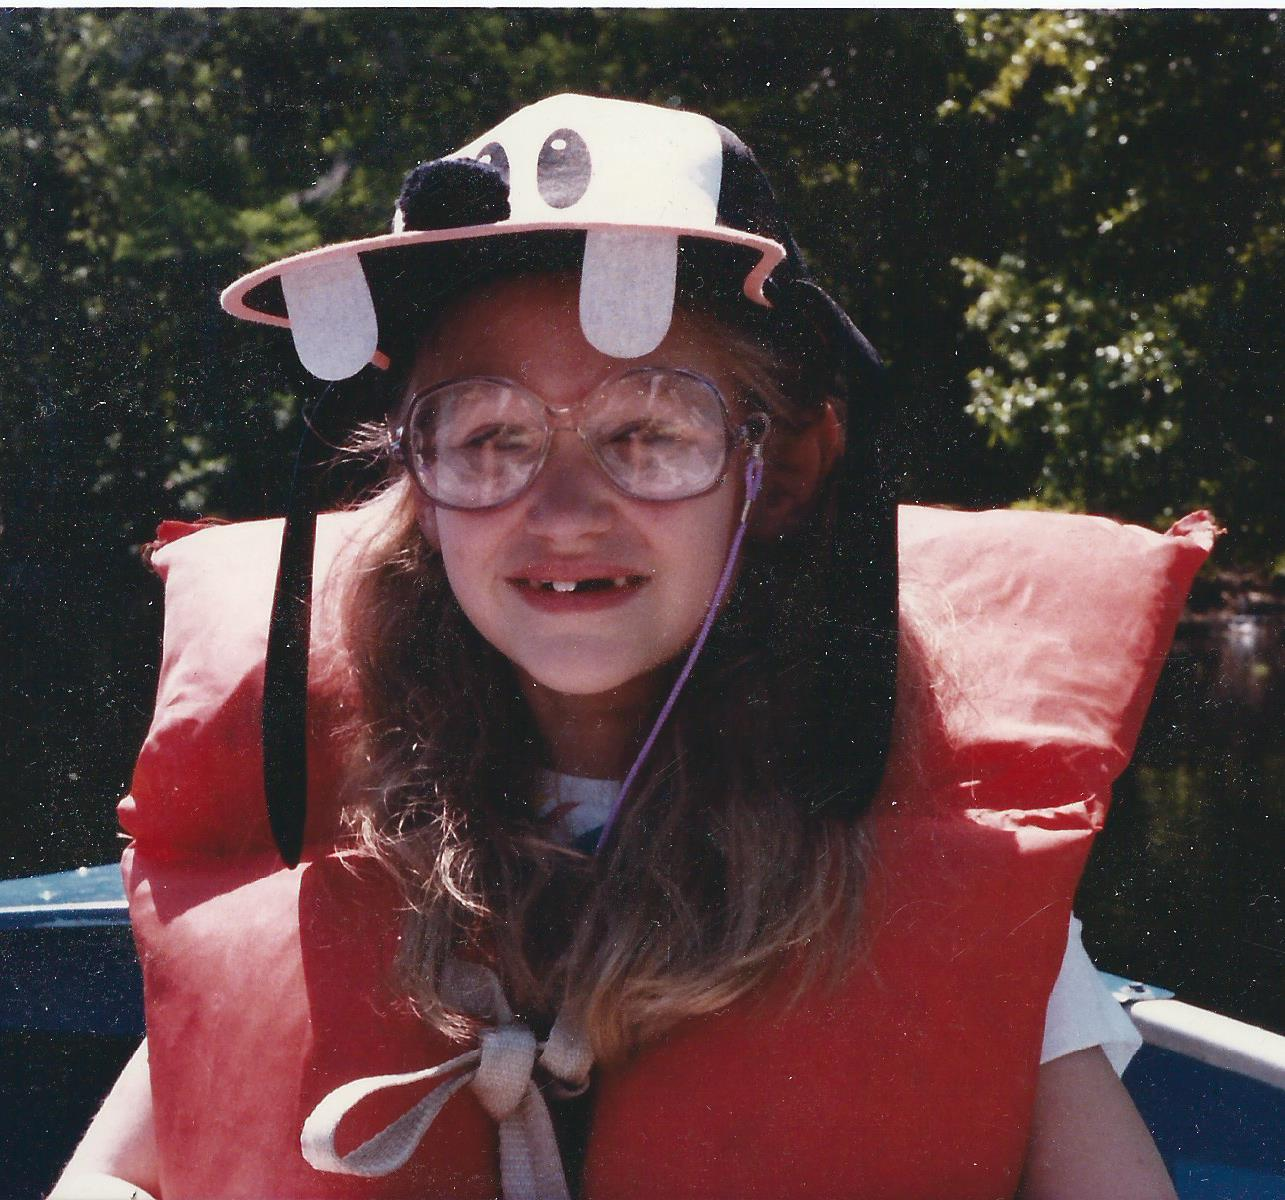 me with goofy hat